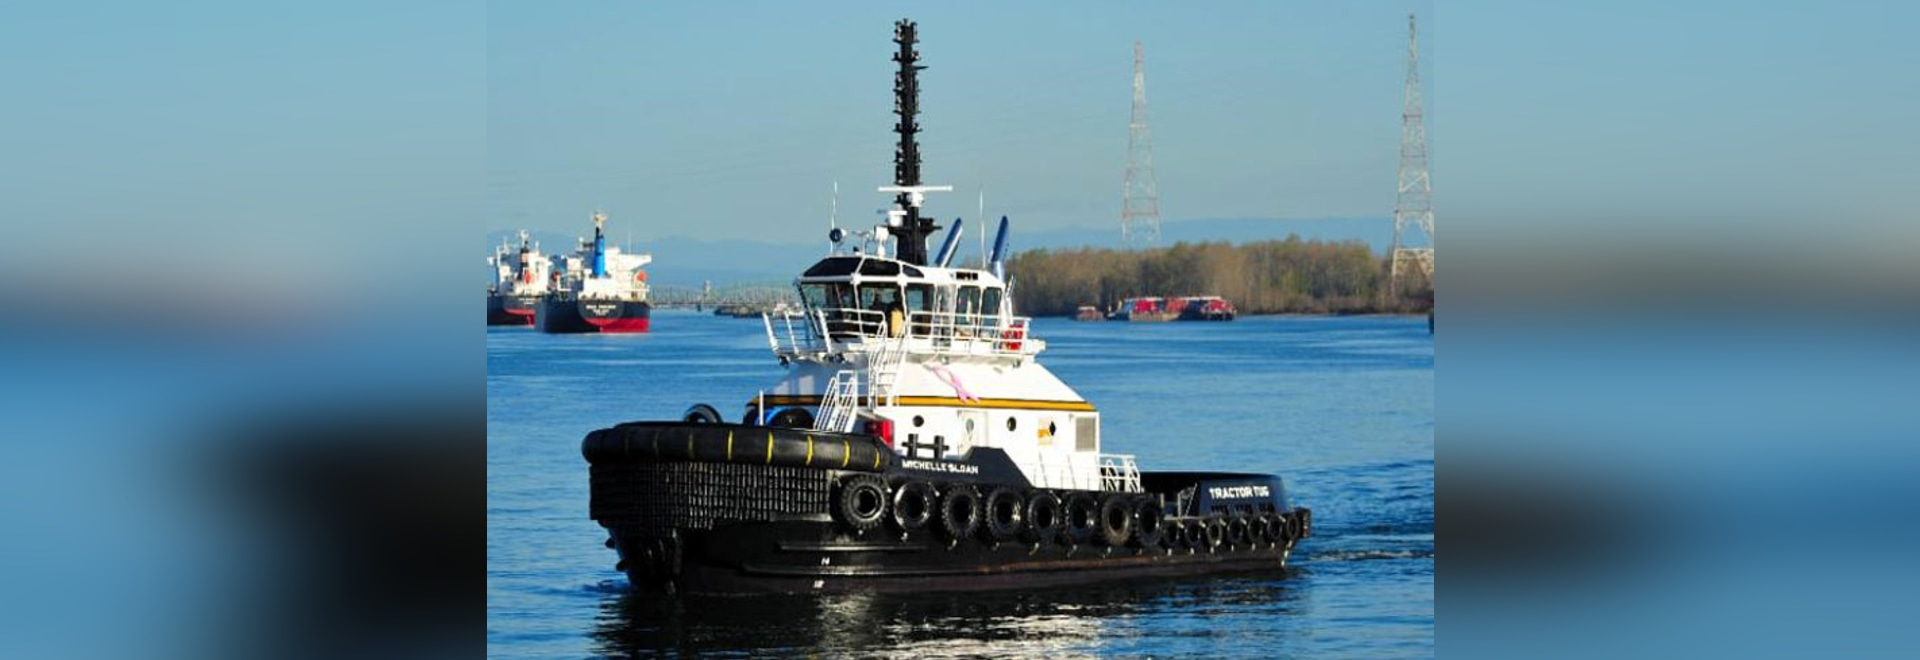 Harley Marine adds Michelle Sloan to West Coast fleet